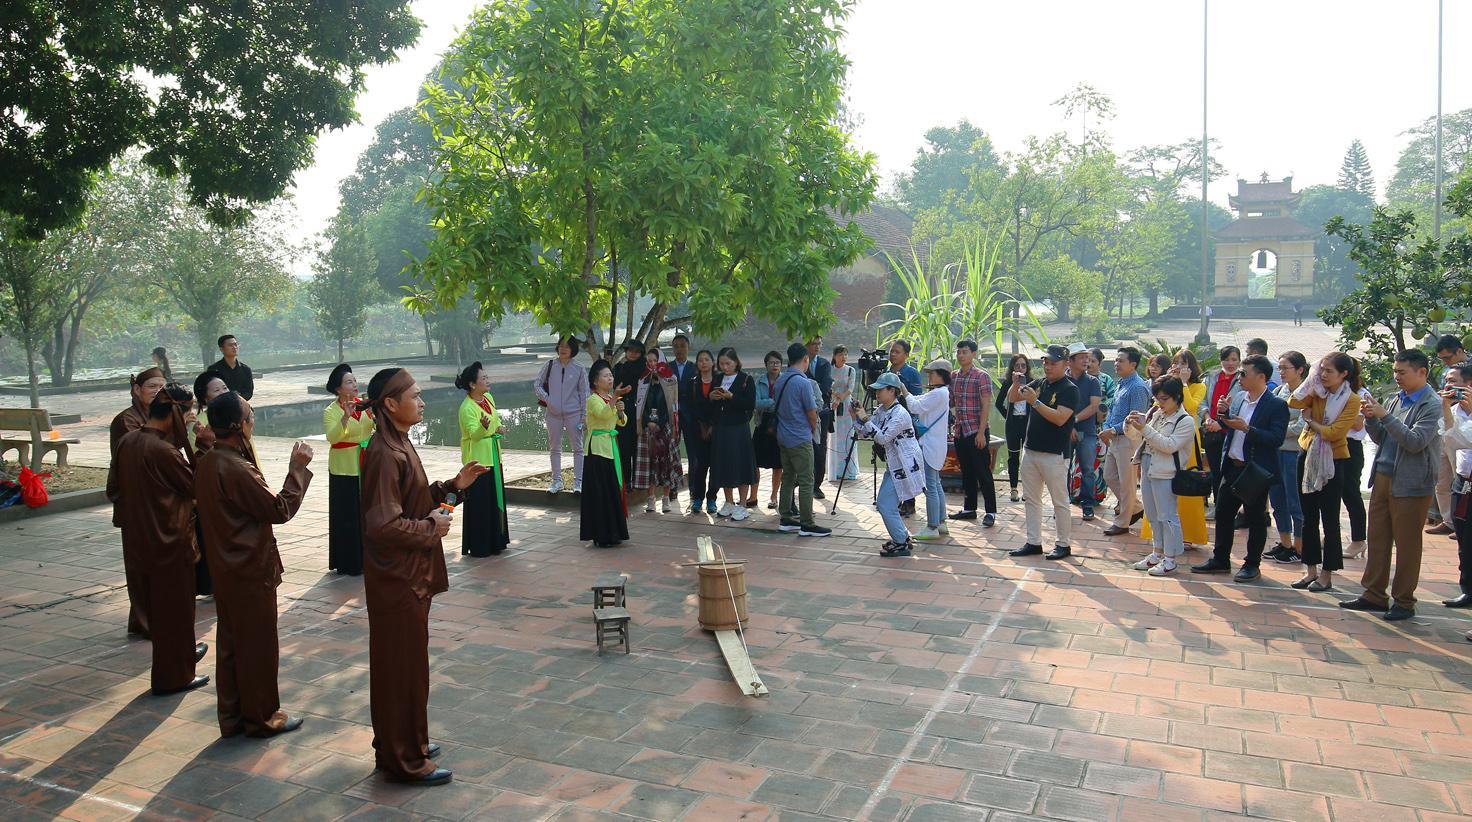 http://hungyentourism.com.vn/an-tuong-mot-ngay-ve-khoai-chau